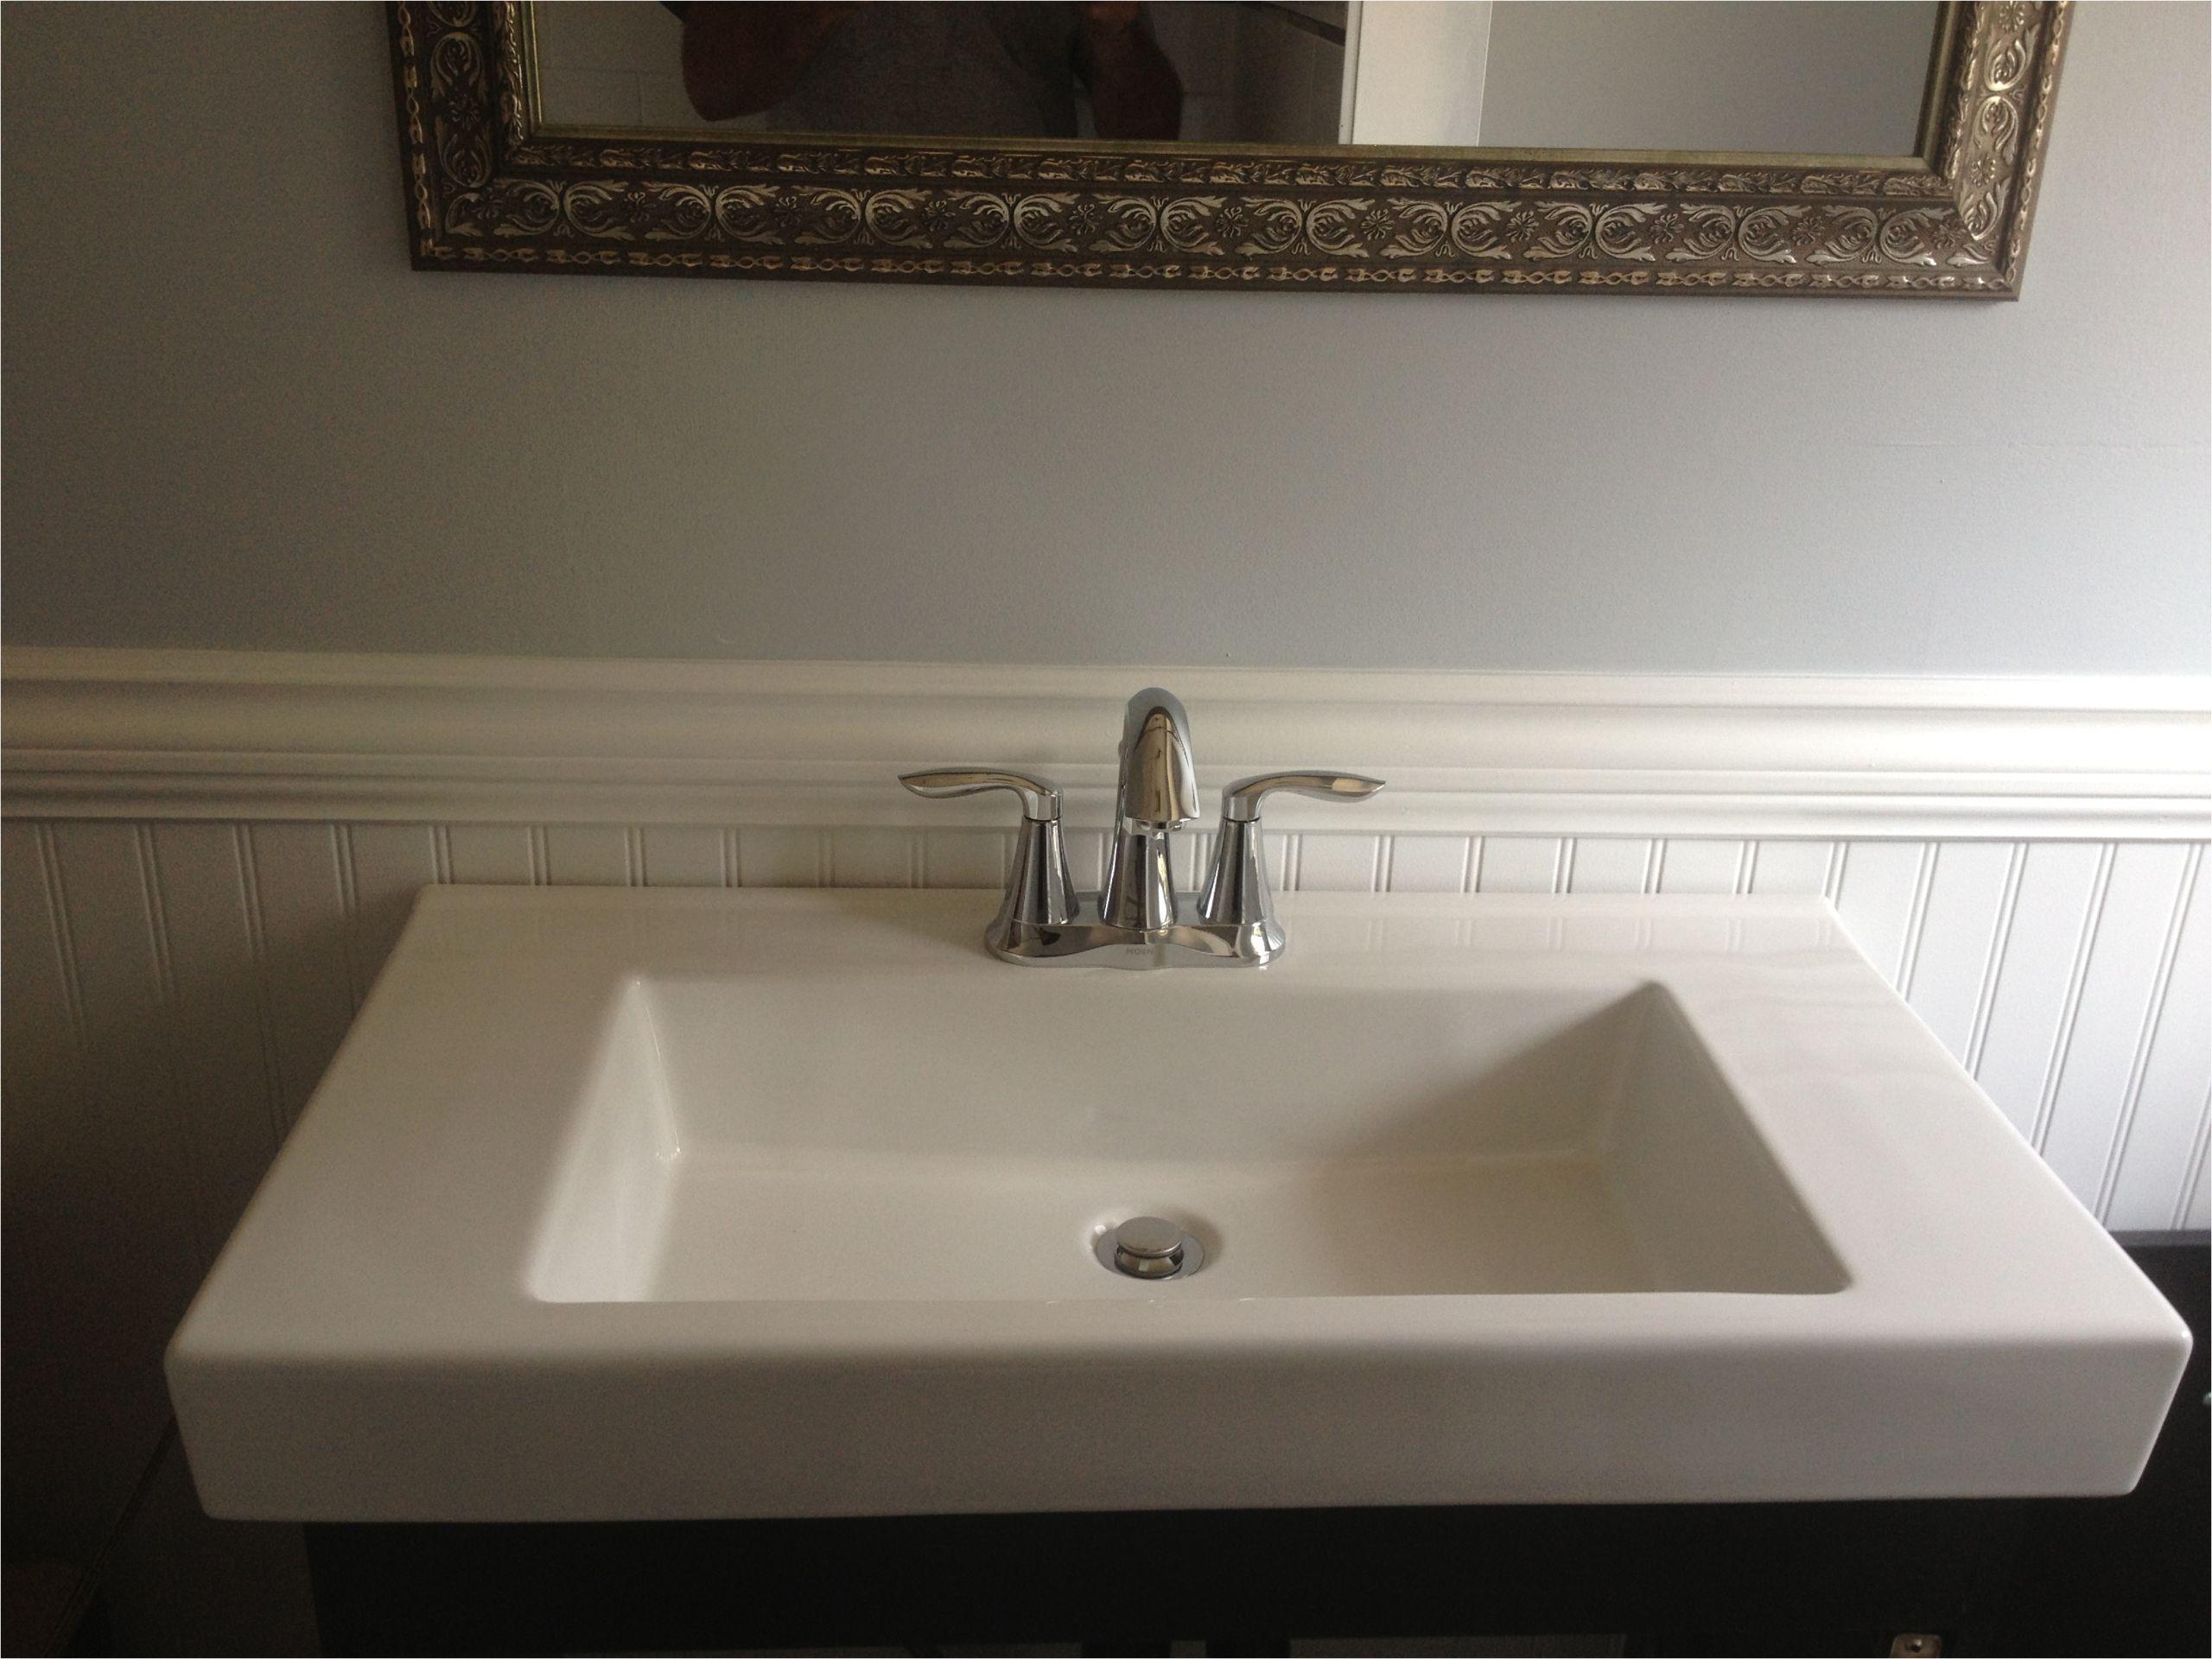 Freestanding Tub Faucet Rona 41 Rona Laundry Sink Laundry Faucet Rona sociedadred